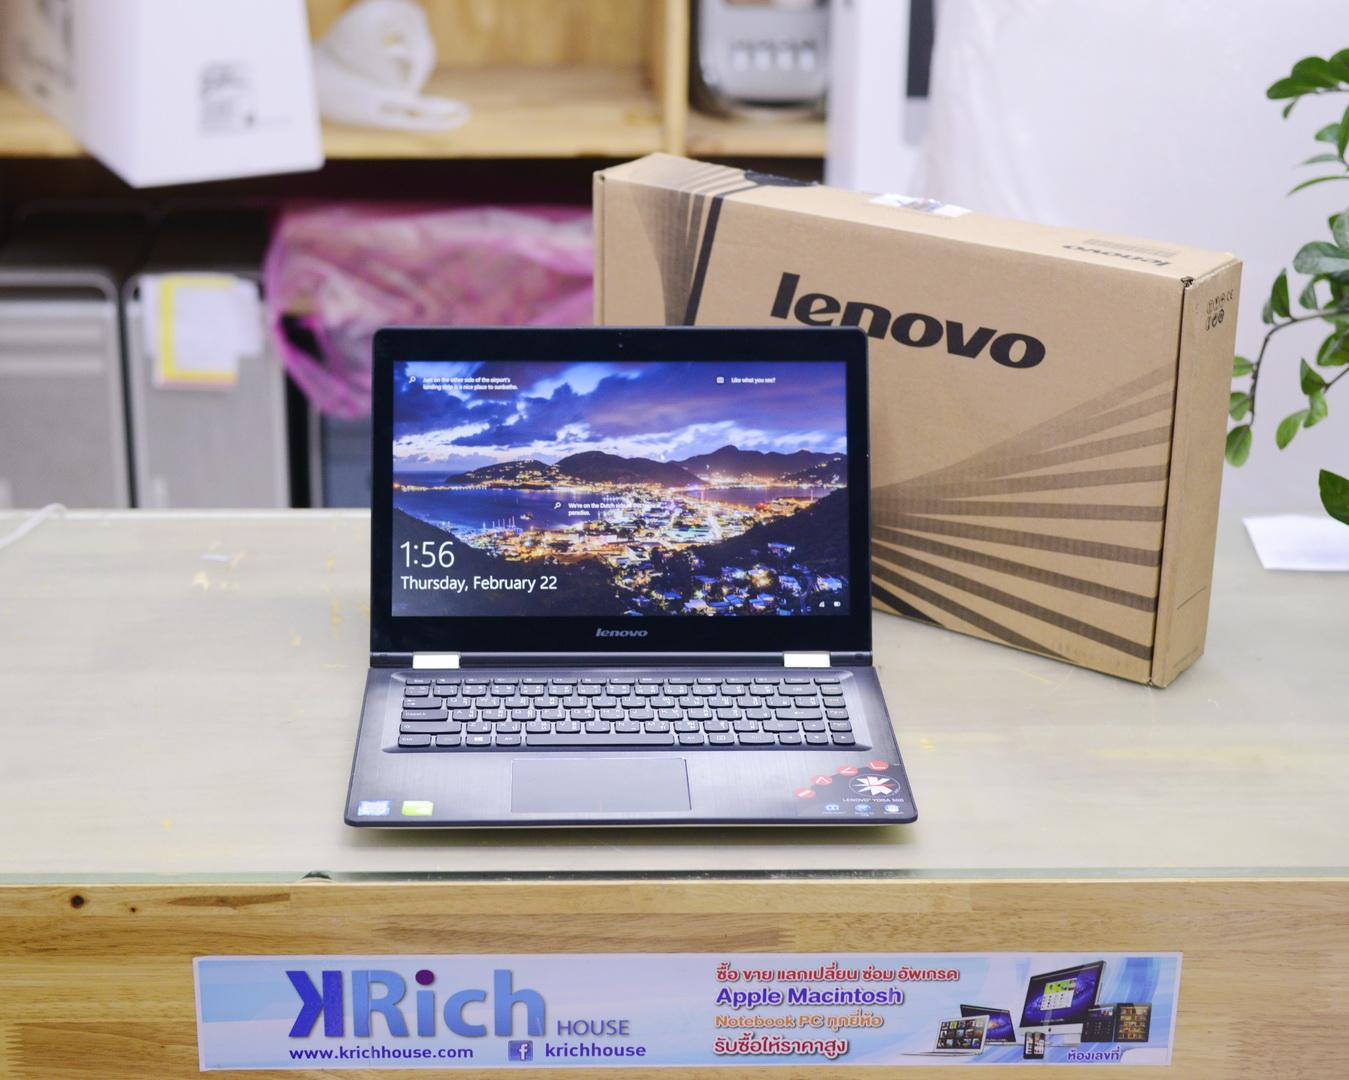 Lenovo IdeaPad Yoga 500-14ISK Core i5-6200U 2.3GHz RAM 4GB HDD 1TB NVIDIA GeForce GT 940M 2GB Display 14 inch Full HD/IPS Touch Screen - Windows 10 License